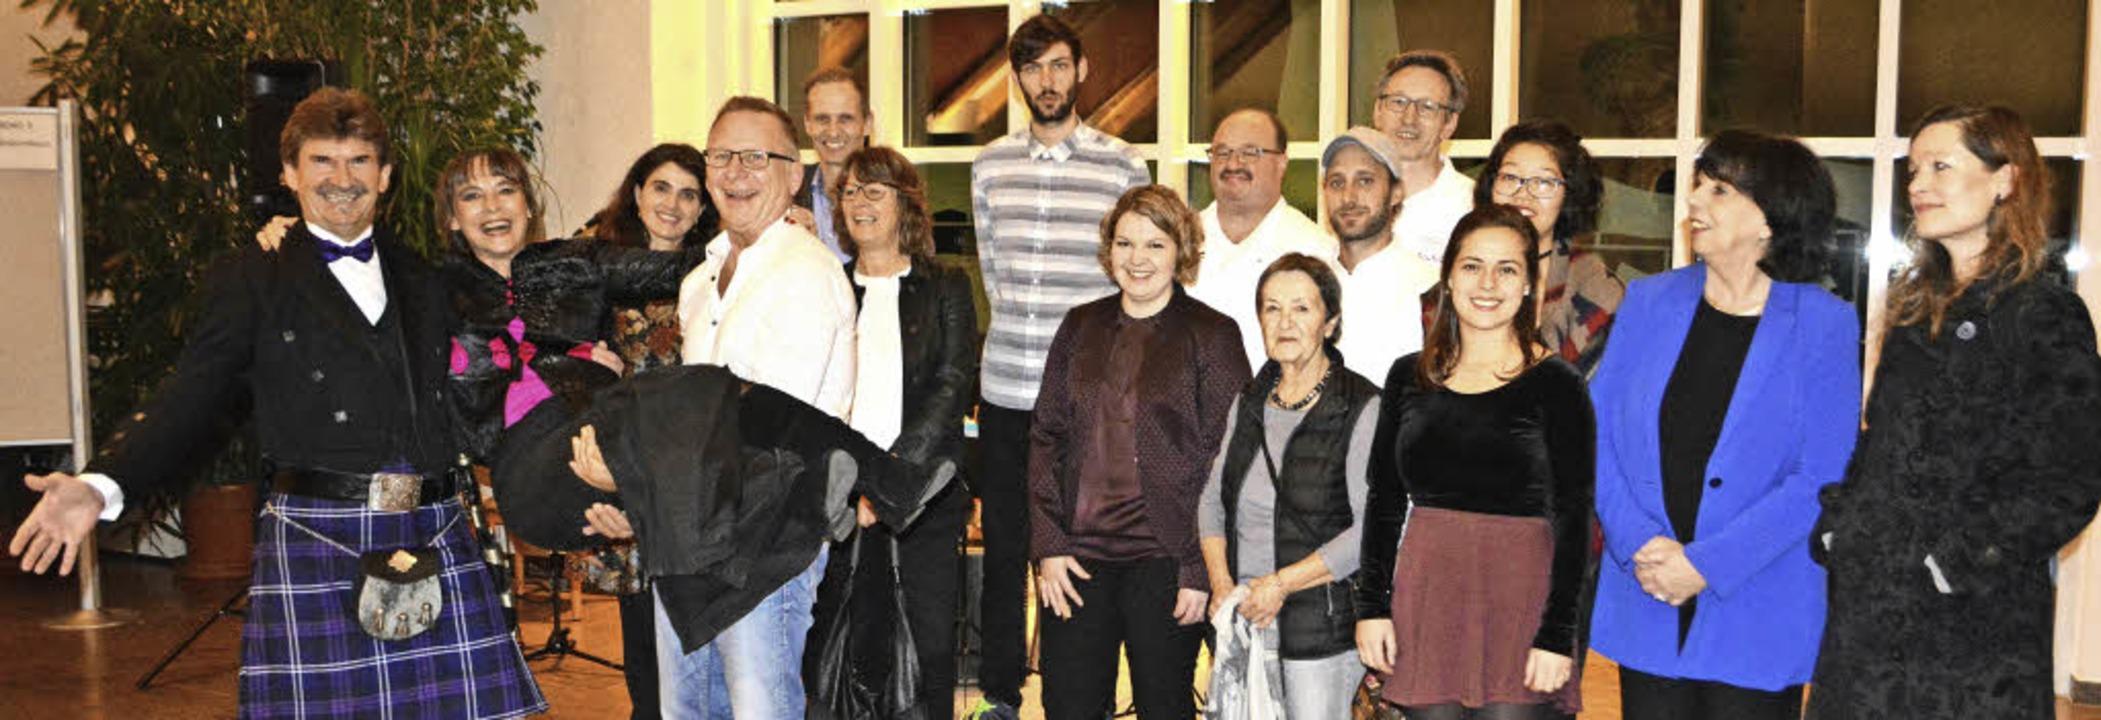 Rundum zufrieden waren alle Beteiligten des 10. Sinneswandel in Endingen.   | Foto: Privat